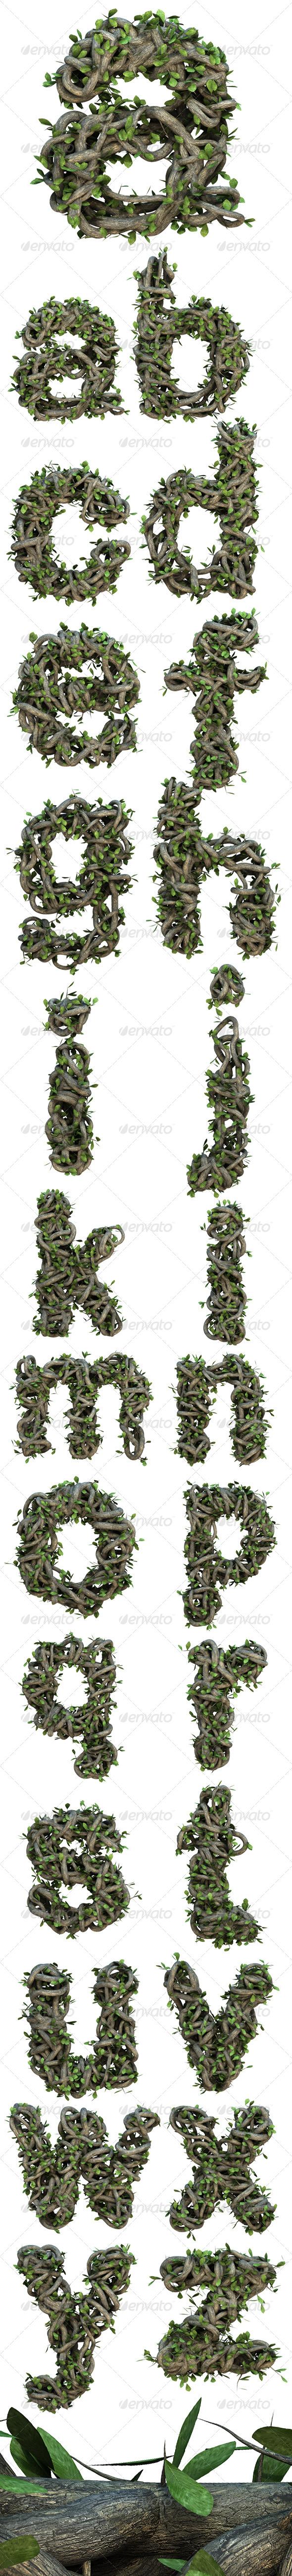 GraphicRiver Ivy Lowercase Alphabet 6612821